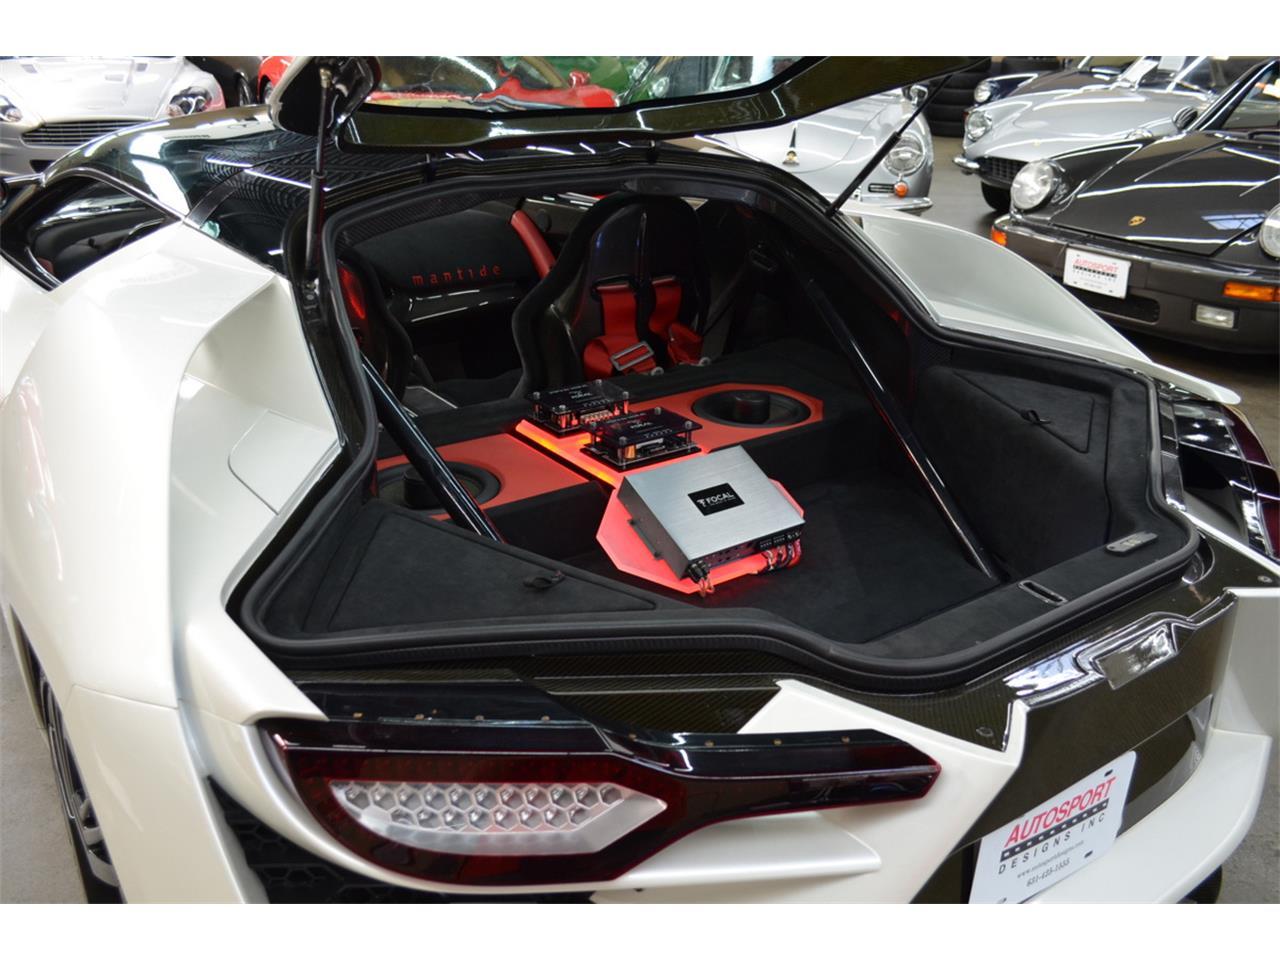 2009 Chevrolet Corvette ZR1 (CC-1317313) for sale in Huntington Station, New York